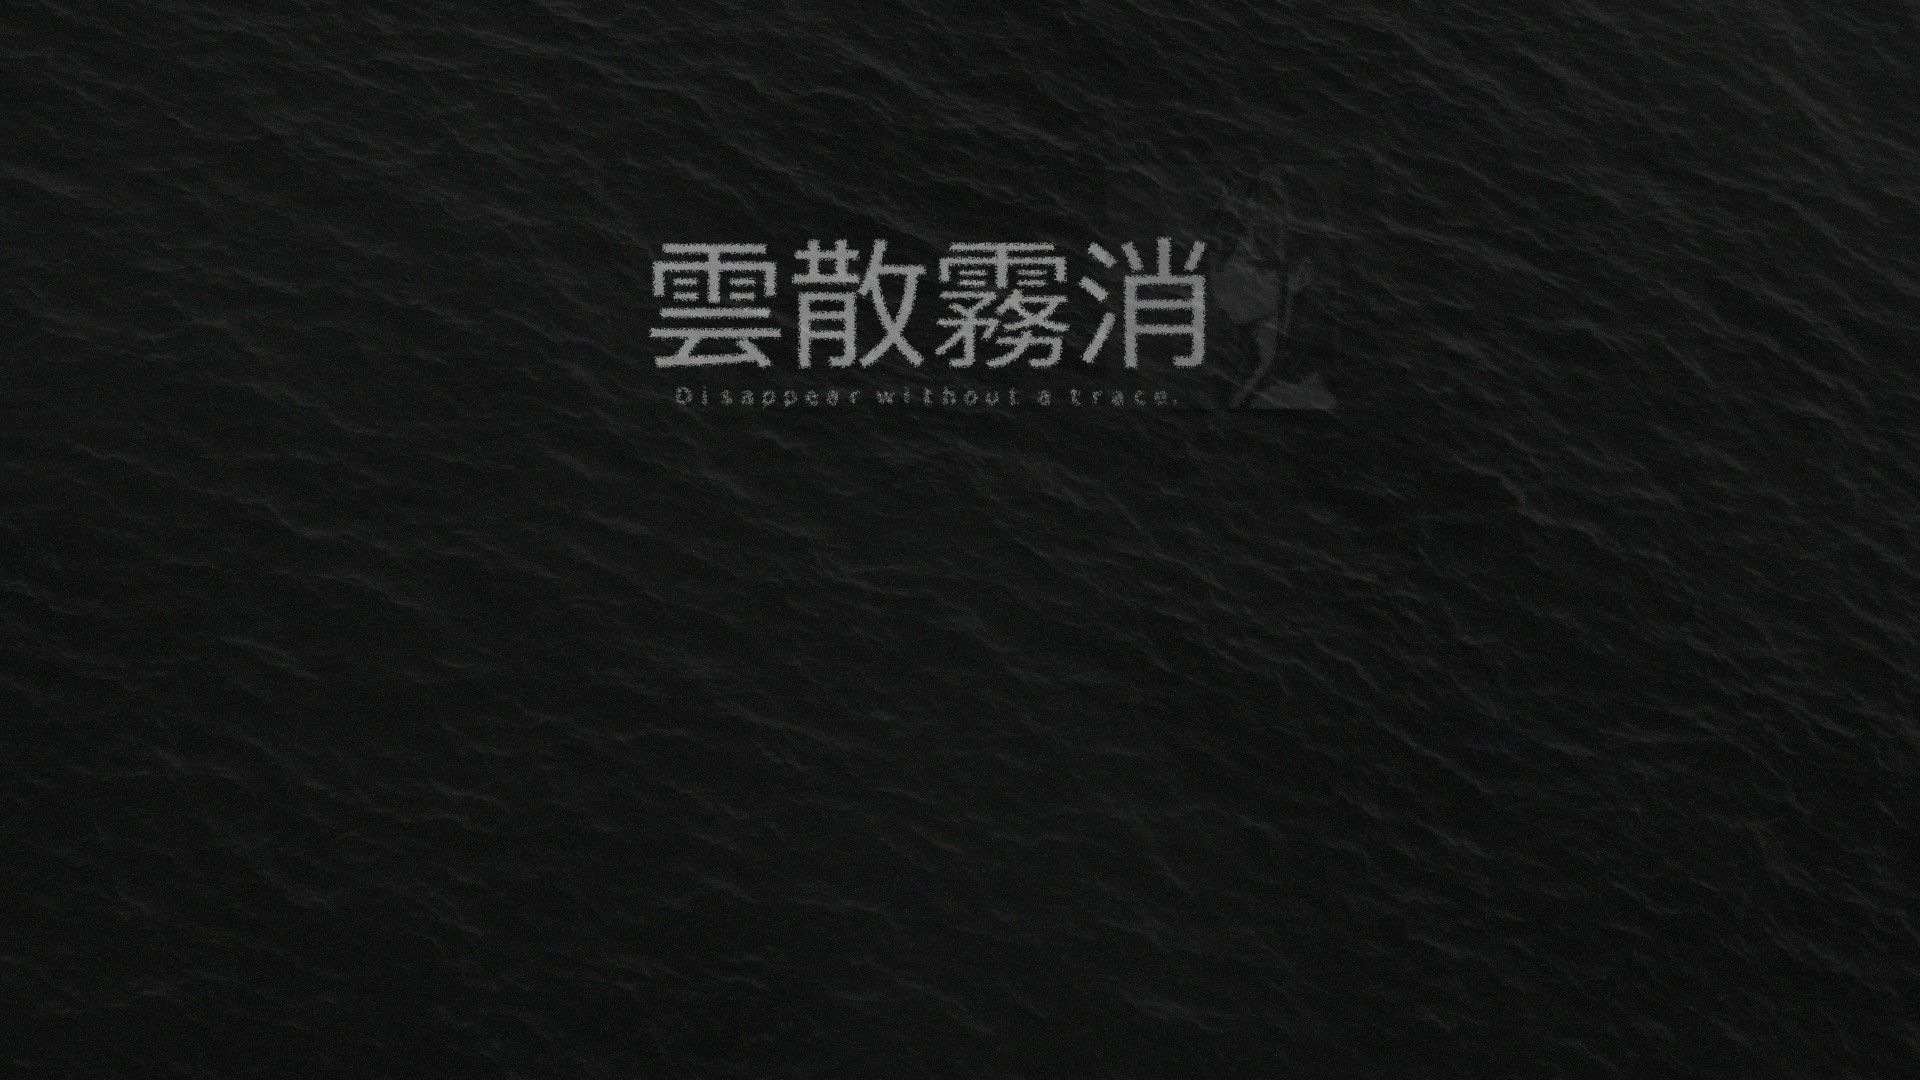 Black Aesthetic Desktop Wallpapers   Top Black Aesthetic 1920x1080